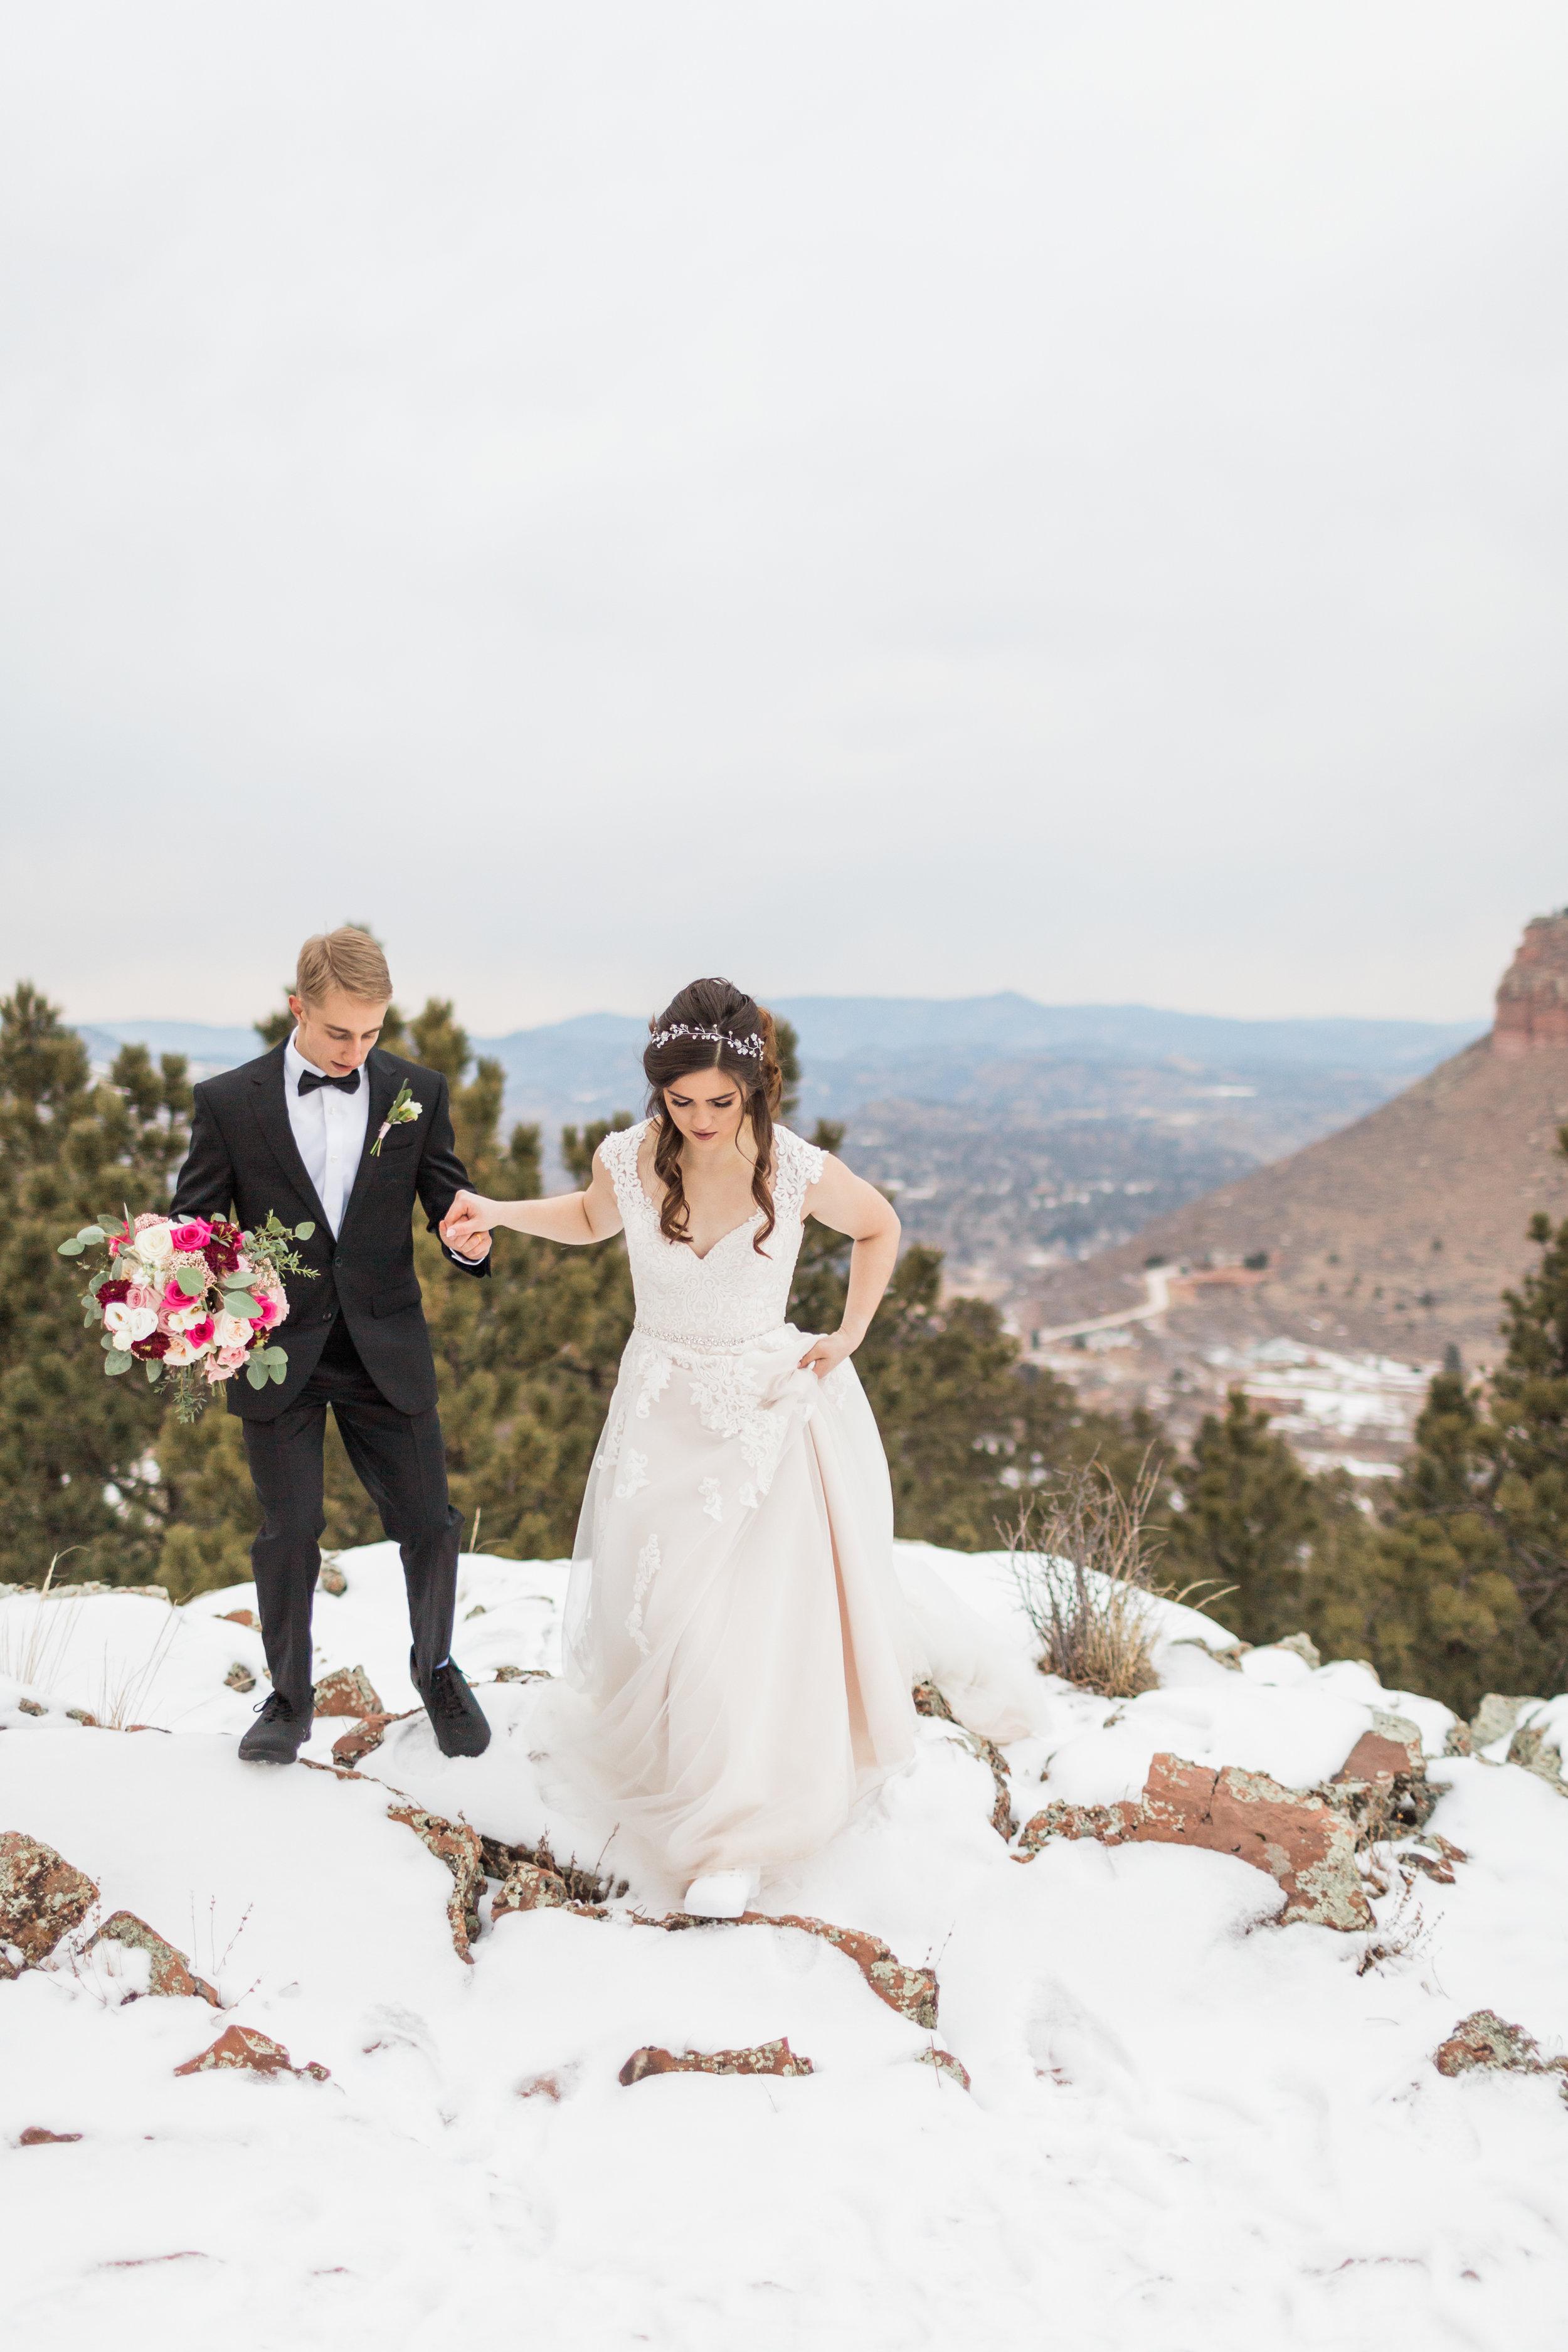 romanticcoloradodestinationwedding-45.jpg